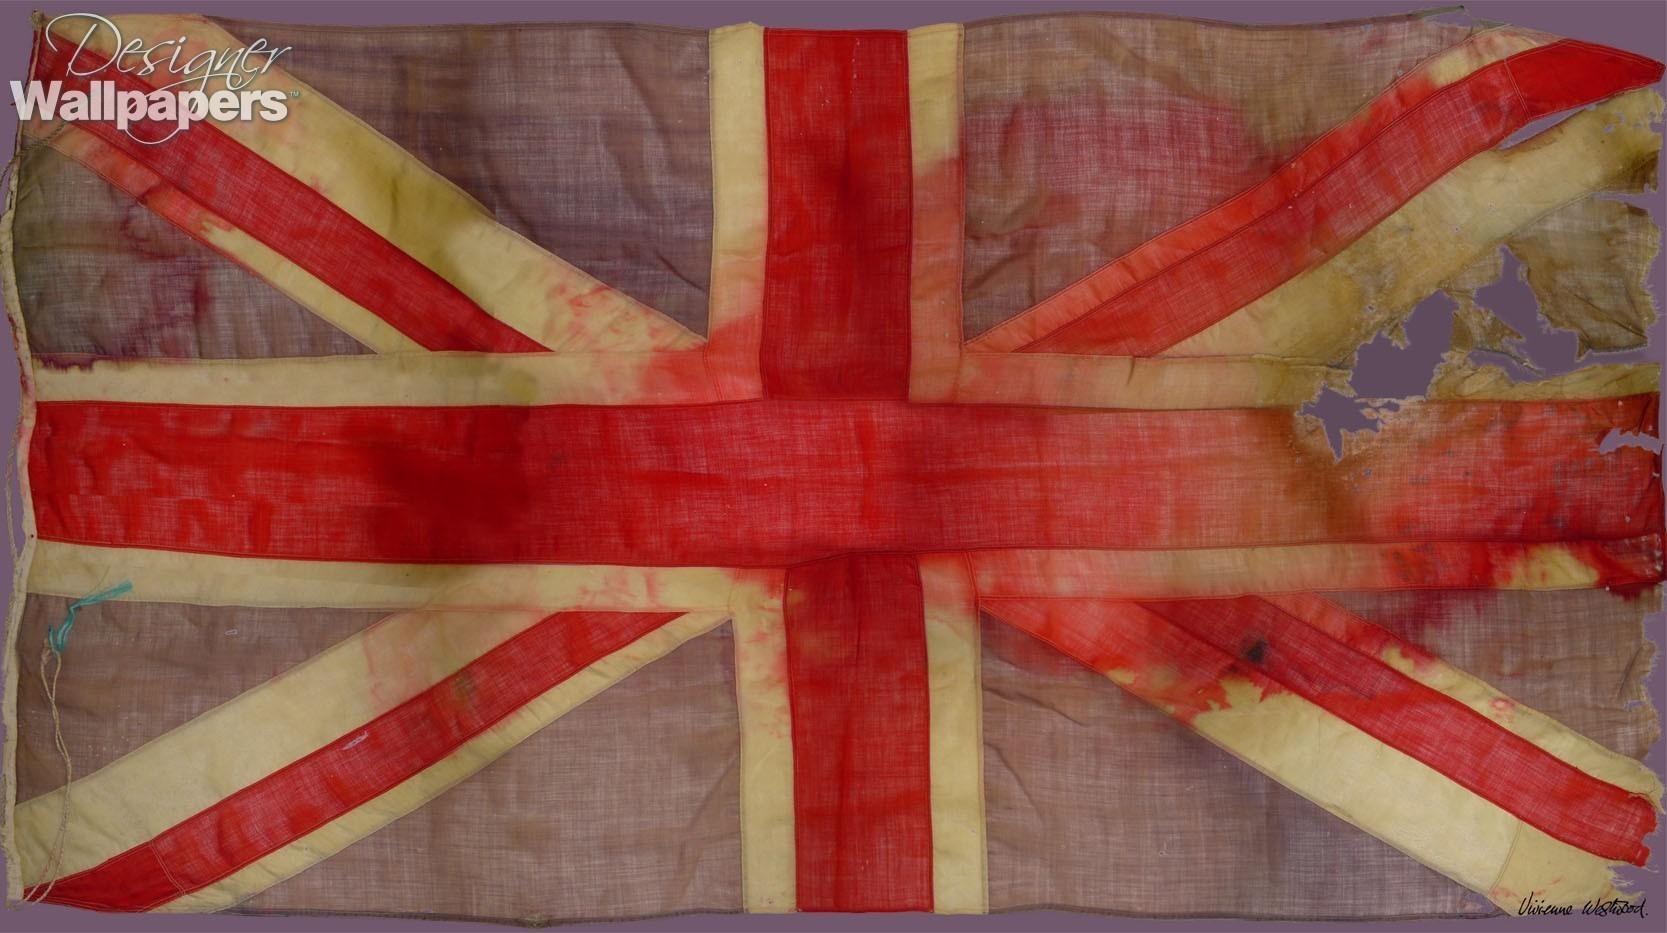 Schoudertas Union Jack : Union jack designer wallpapers